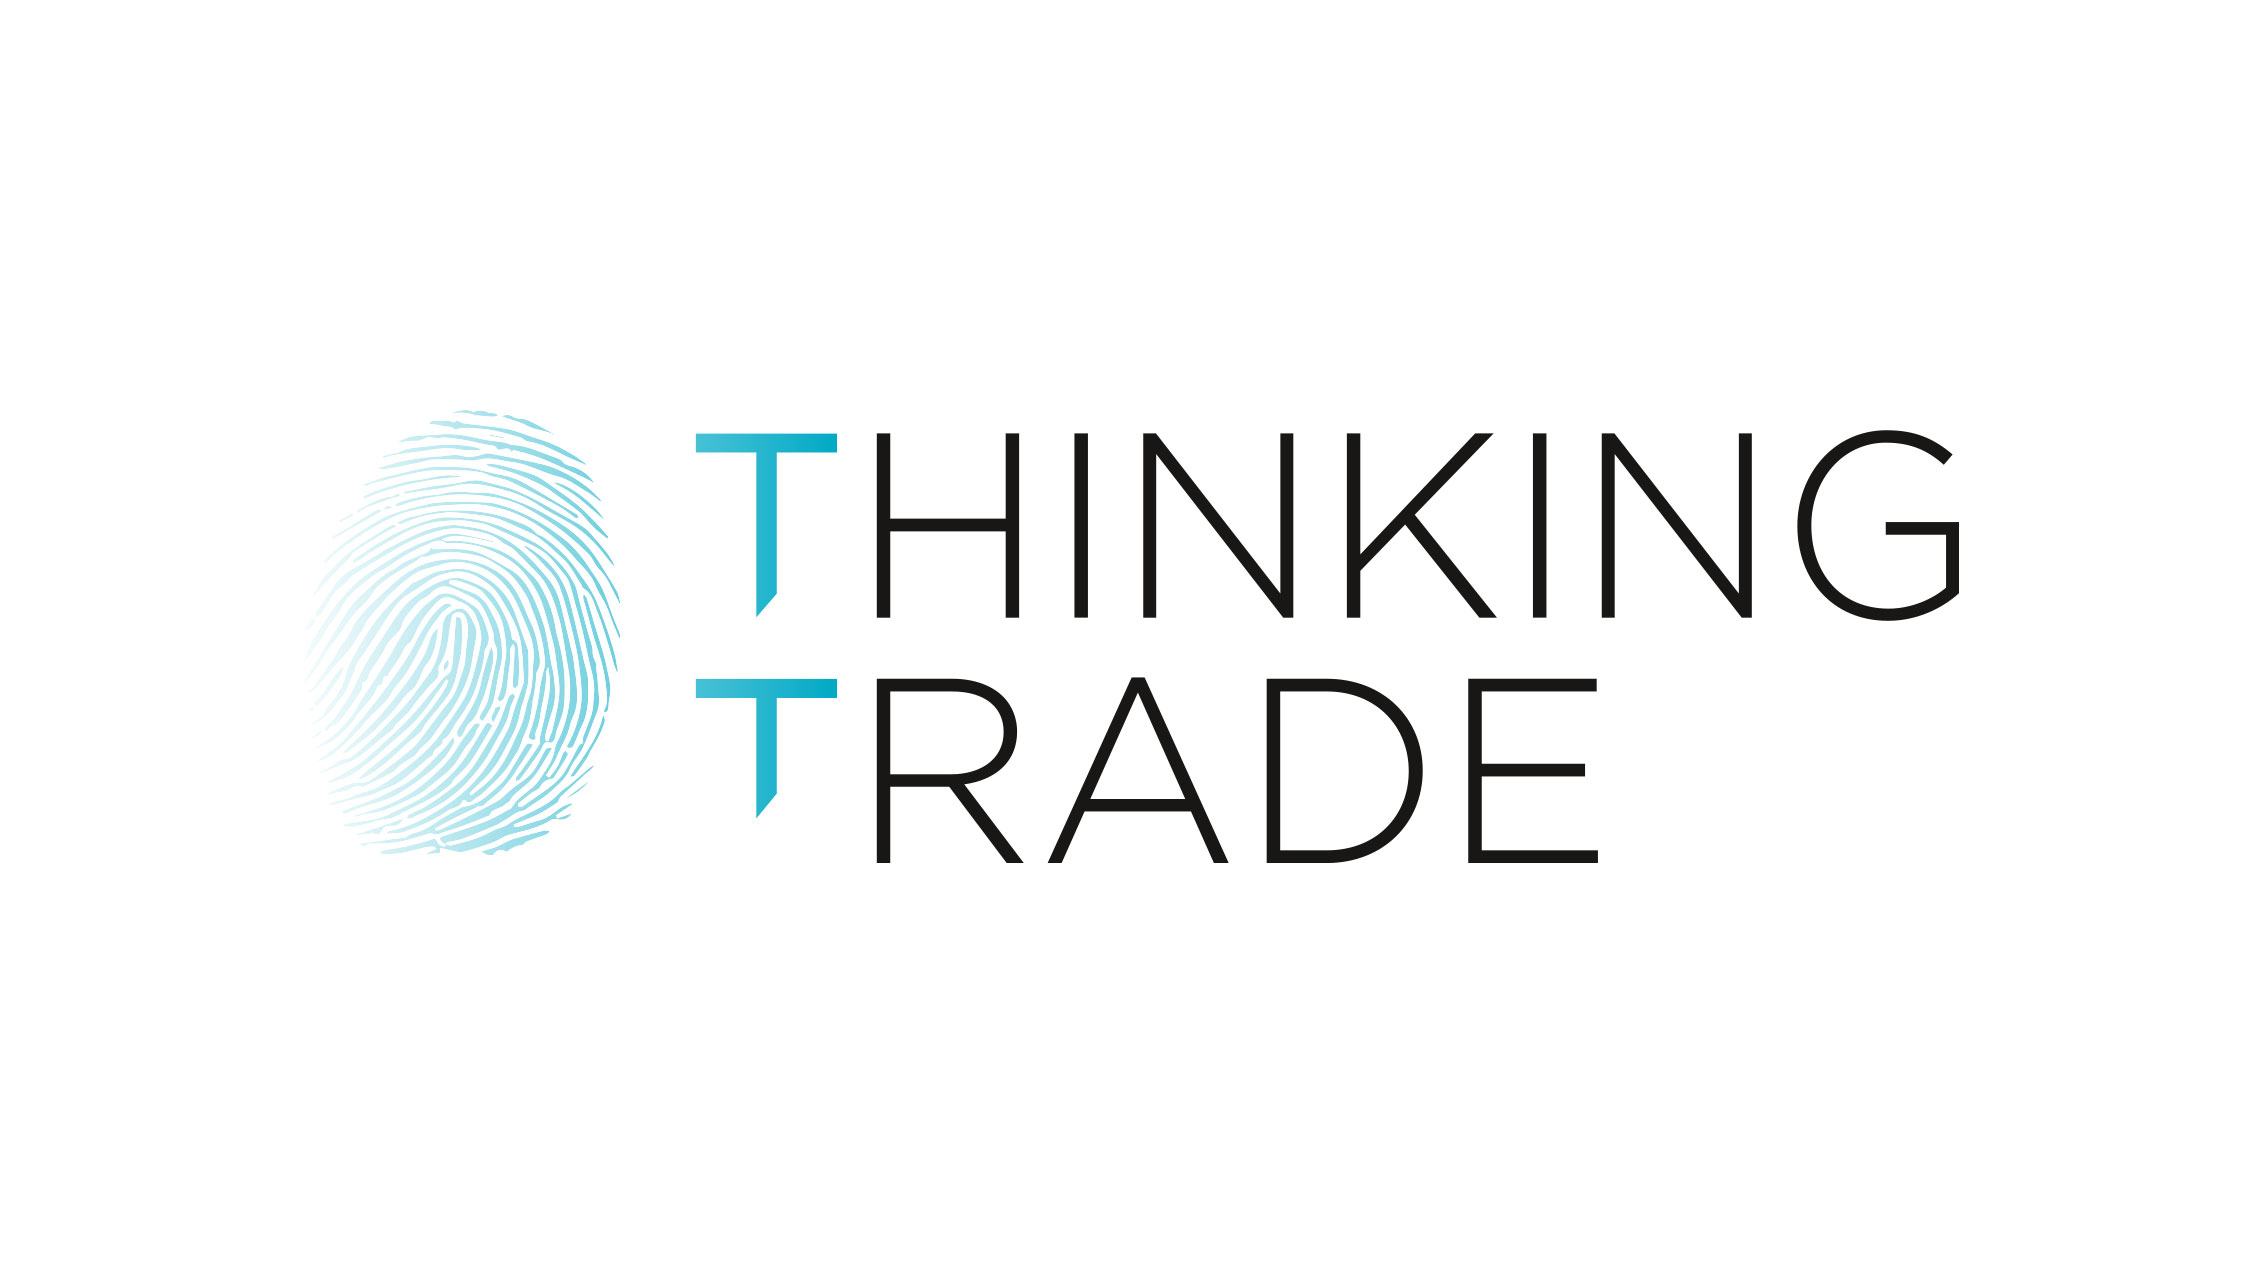 Thinking Trade